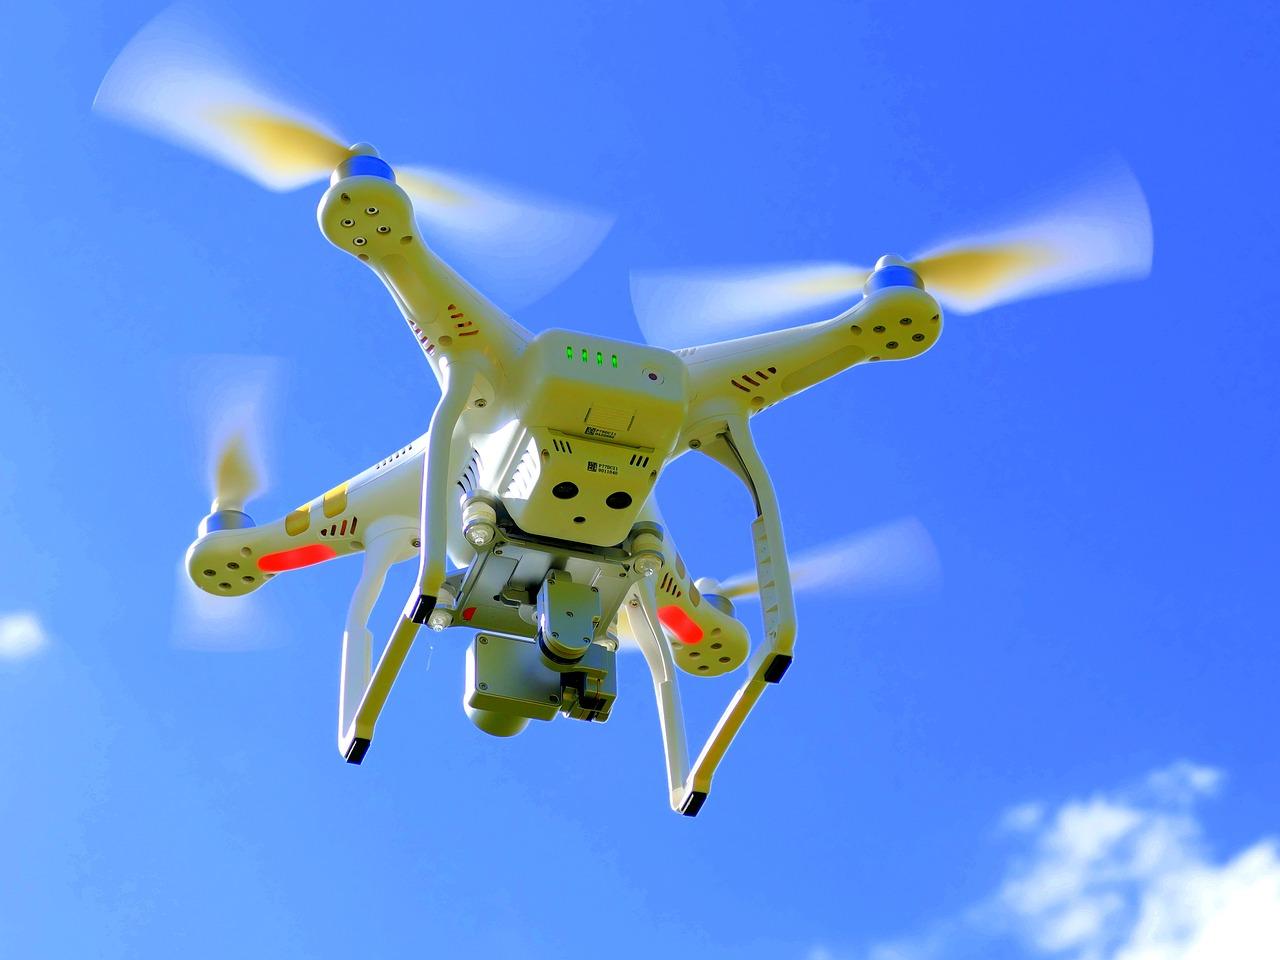 drone-1579120_1280.jpg